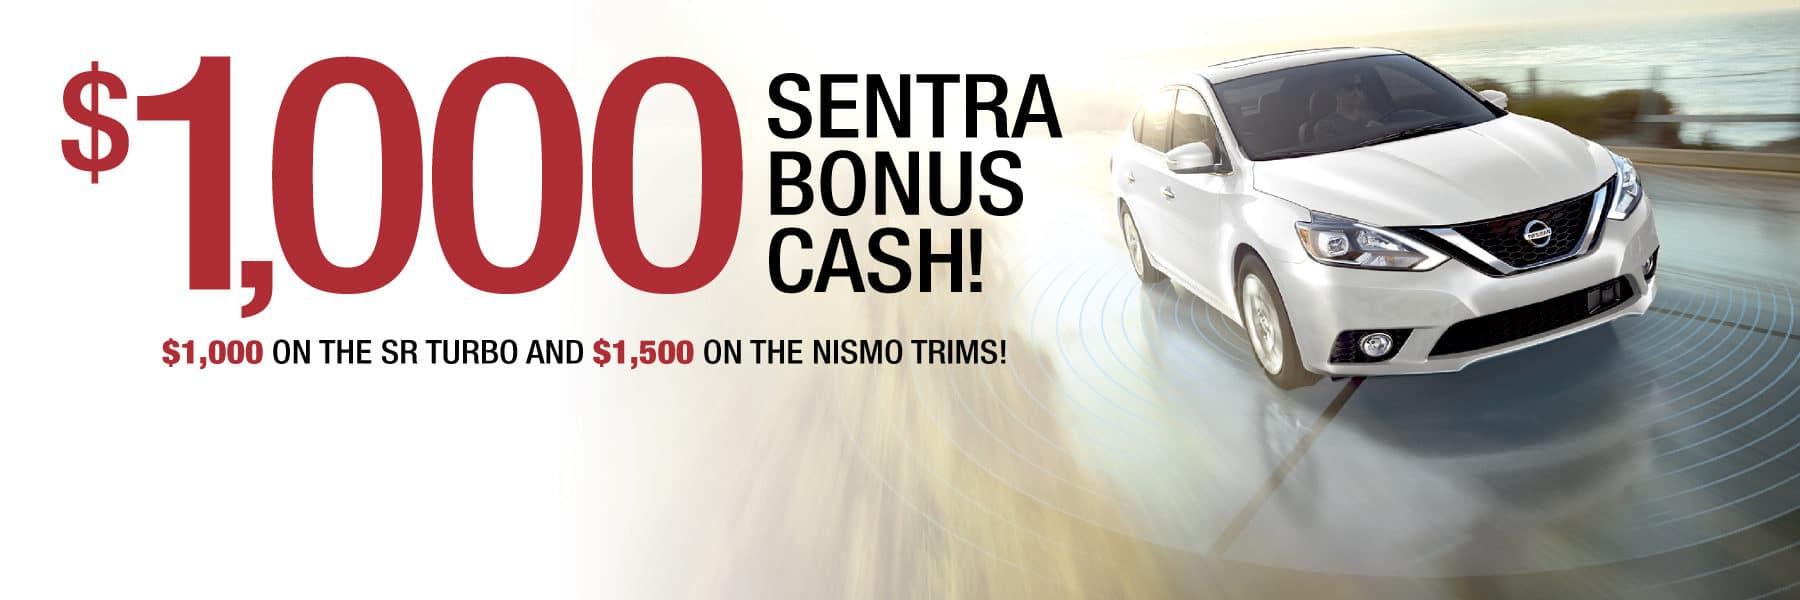 Up to $1,500 Sentra Bonus Cash on SR Turbo and Nismo Trims!